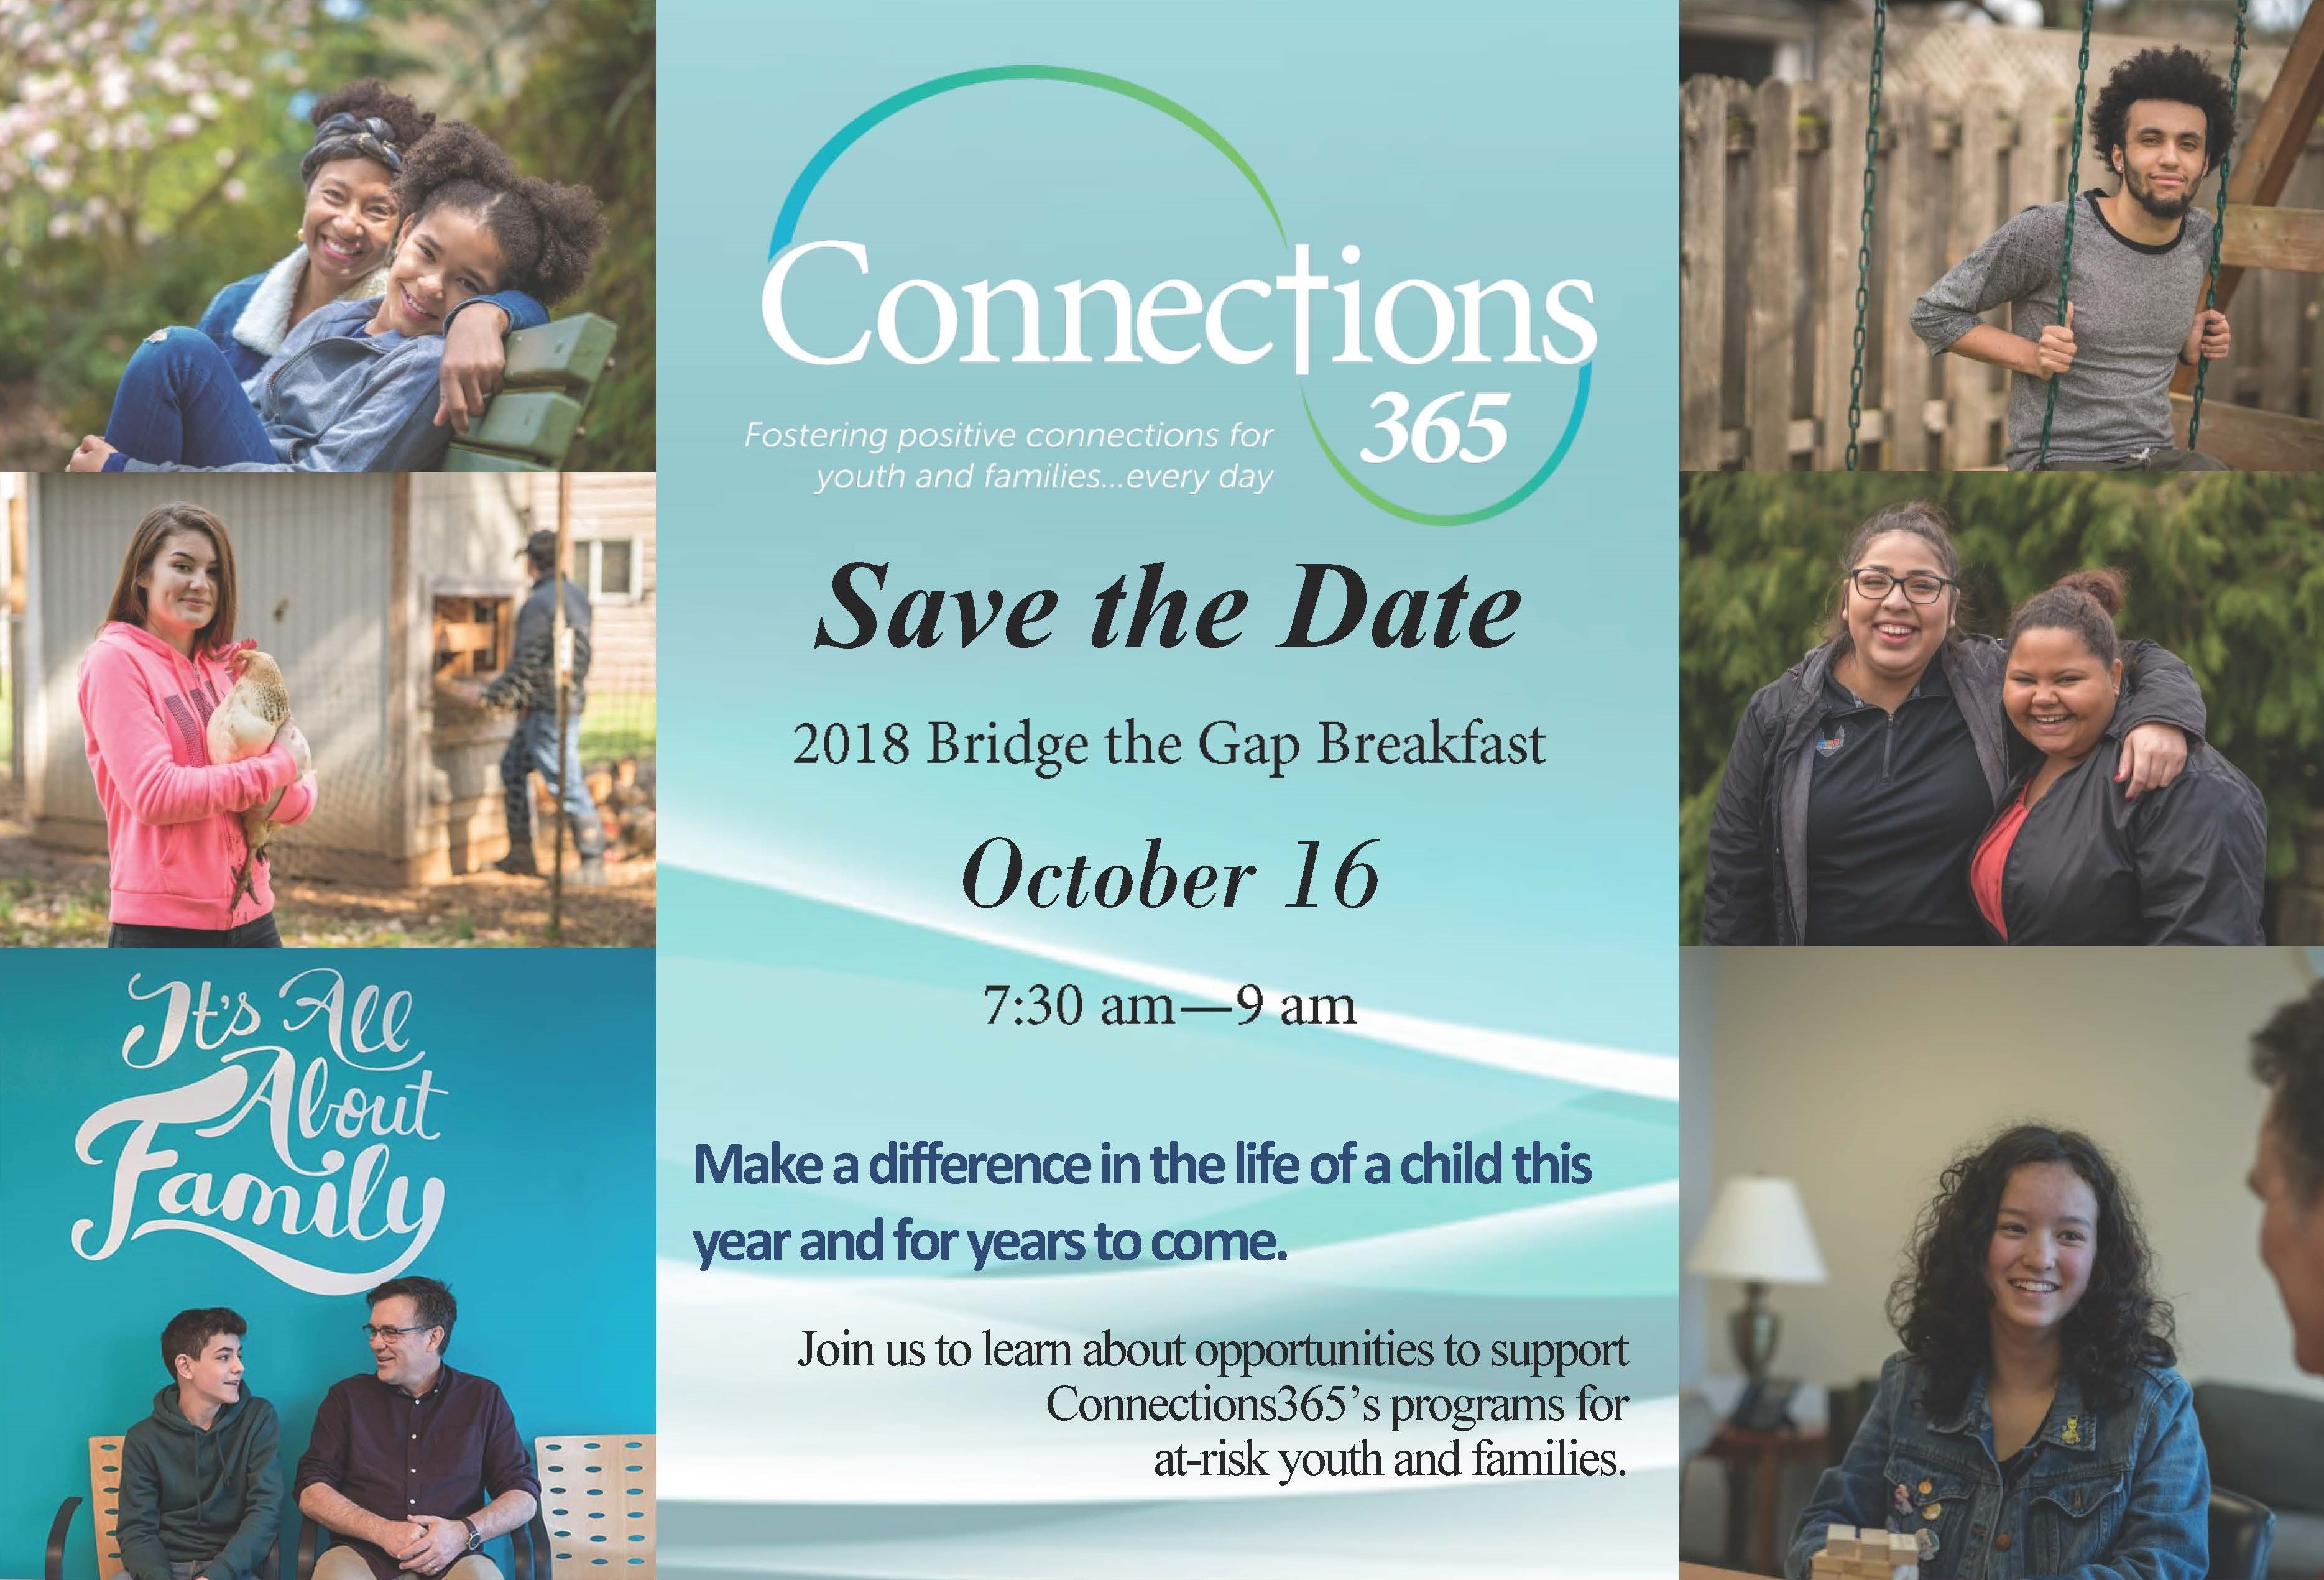 bridge the gap breakfast 2018 connections 365